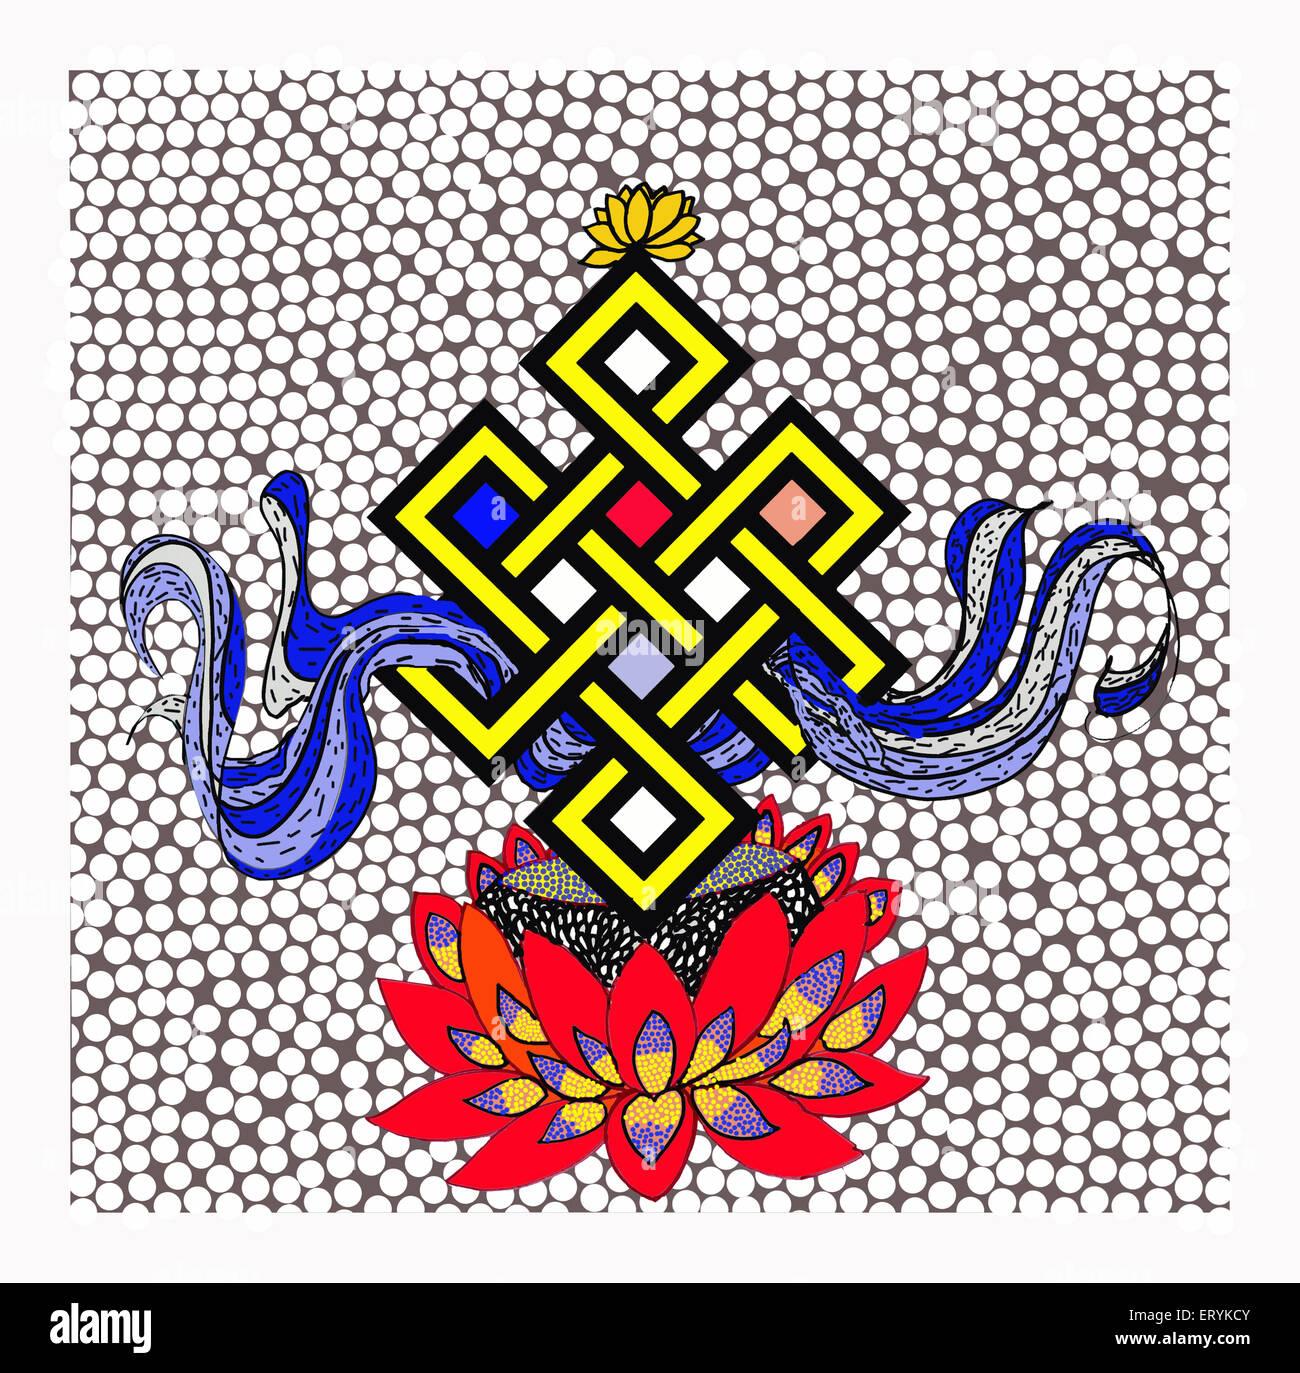 endless knot painting in mumbai at maharashtra India - Stock Image